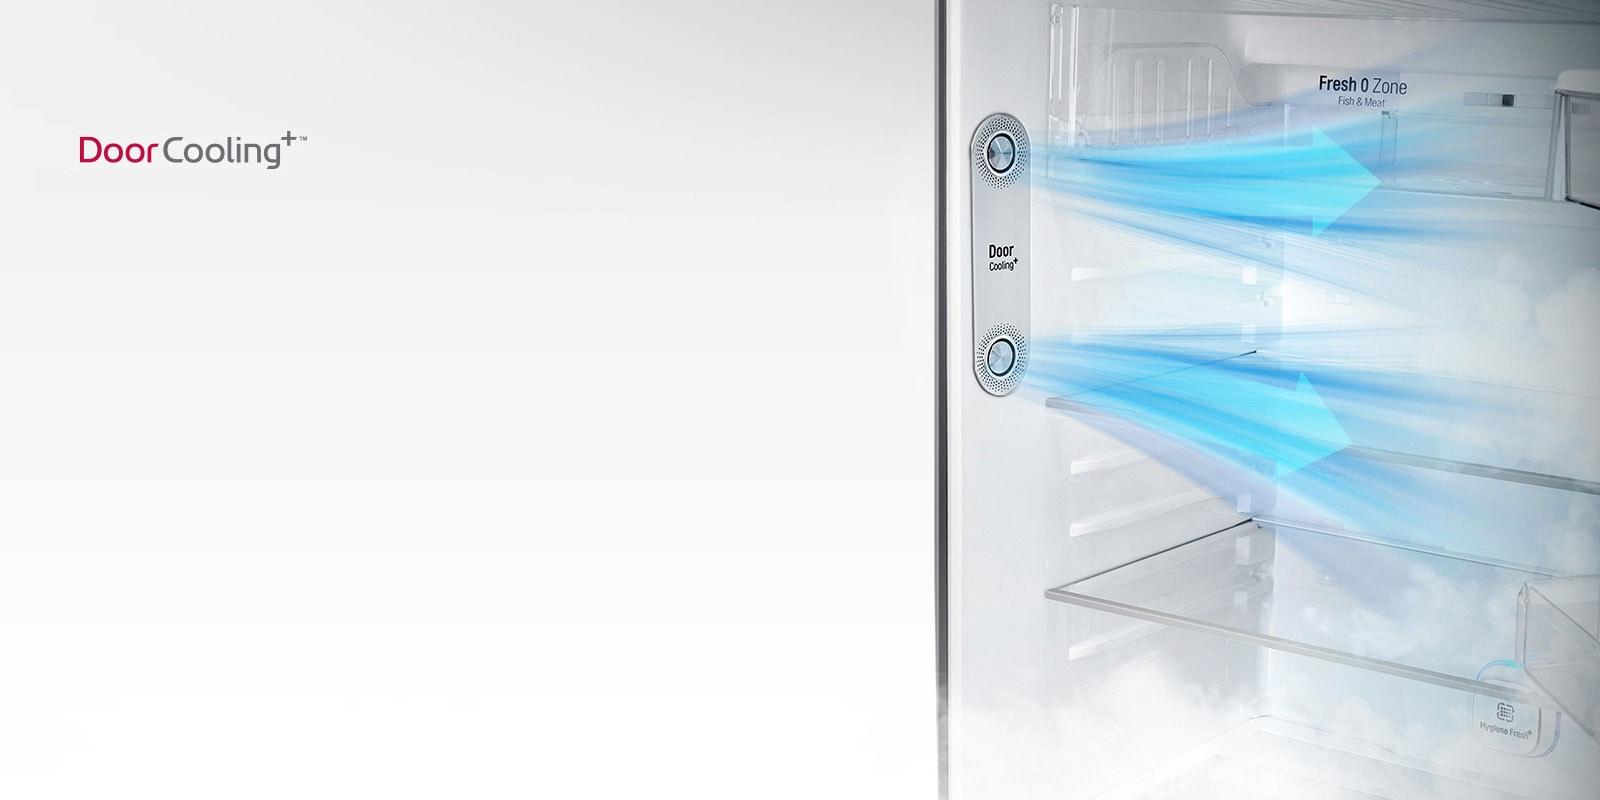 LT32WPPX_DoorCooling_07032019_D